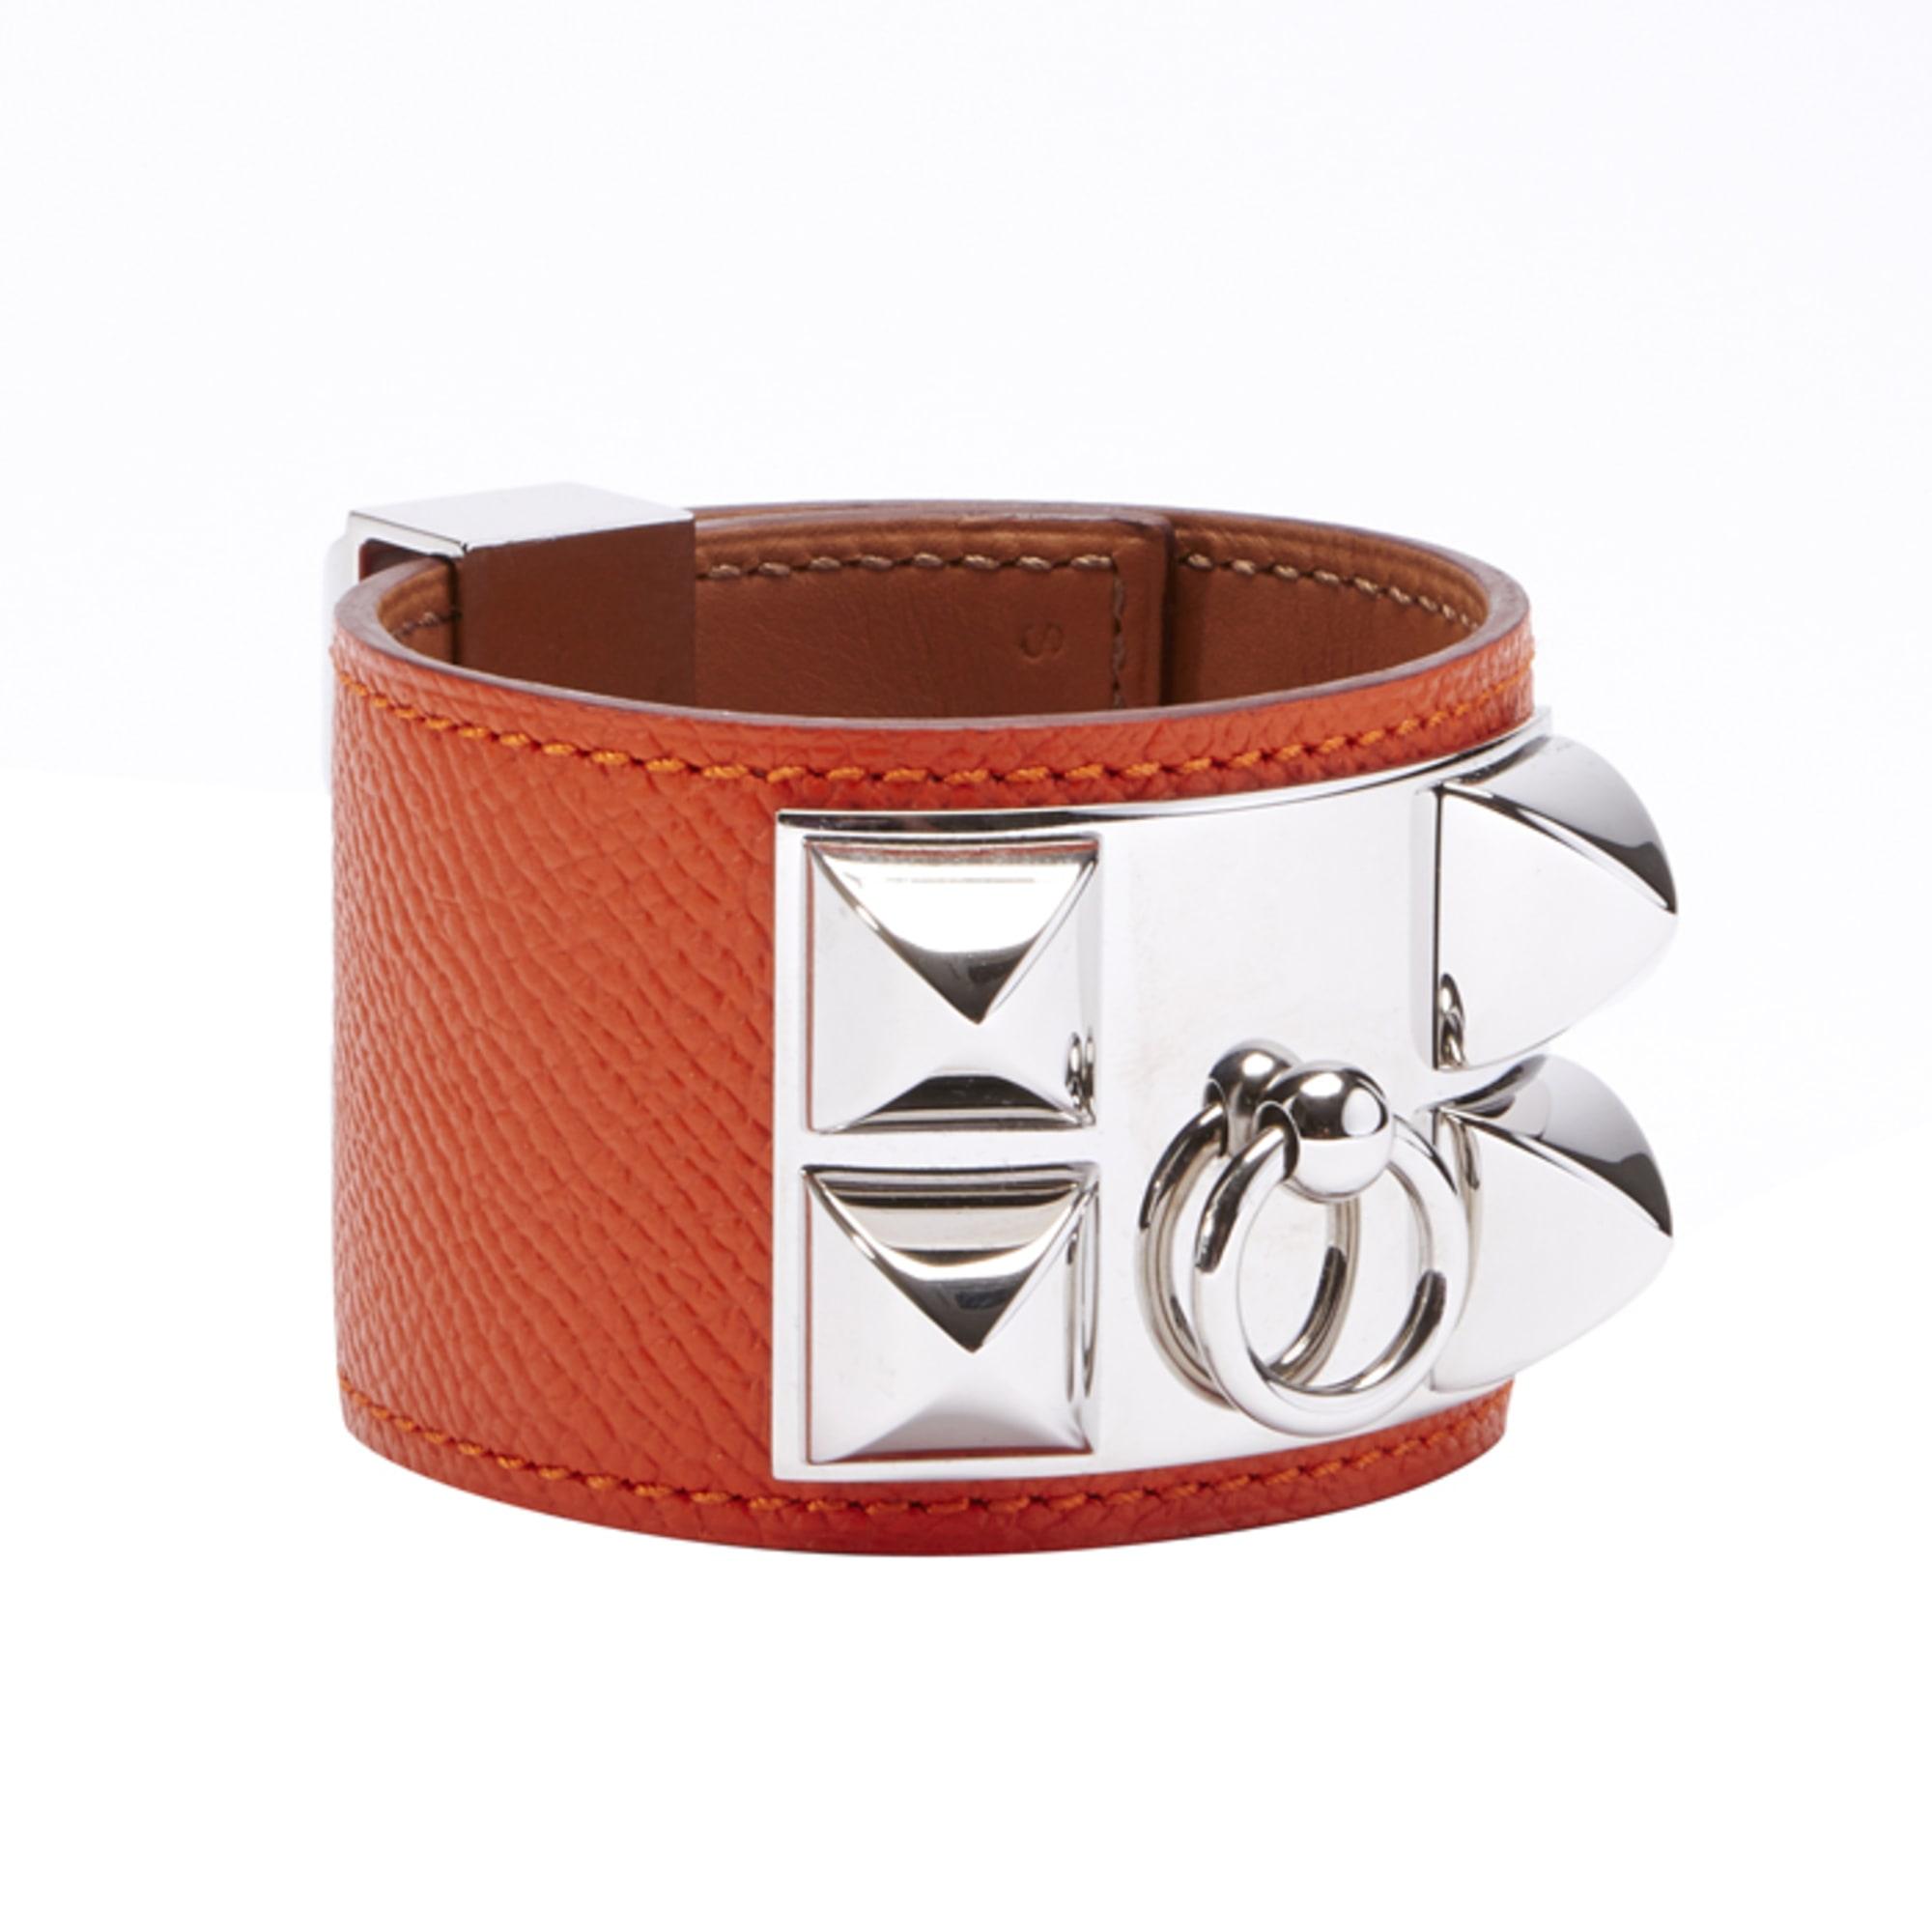 discount hermes bracelet femme carriere cb9e8 227f9 f52c7c11f26